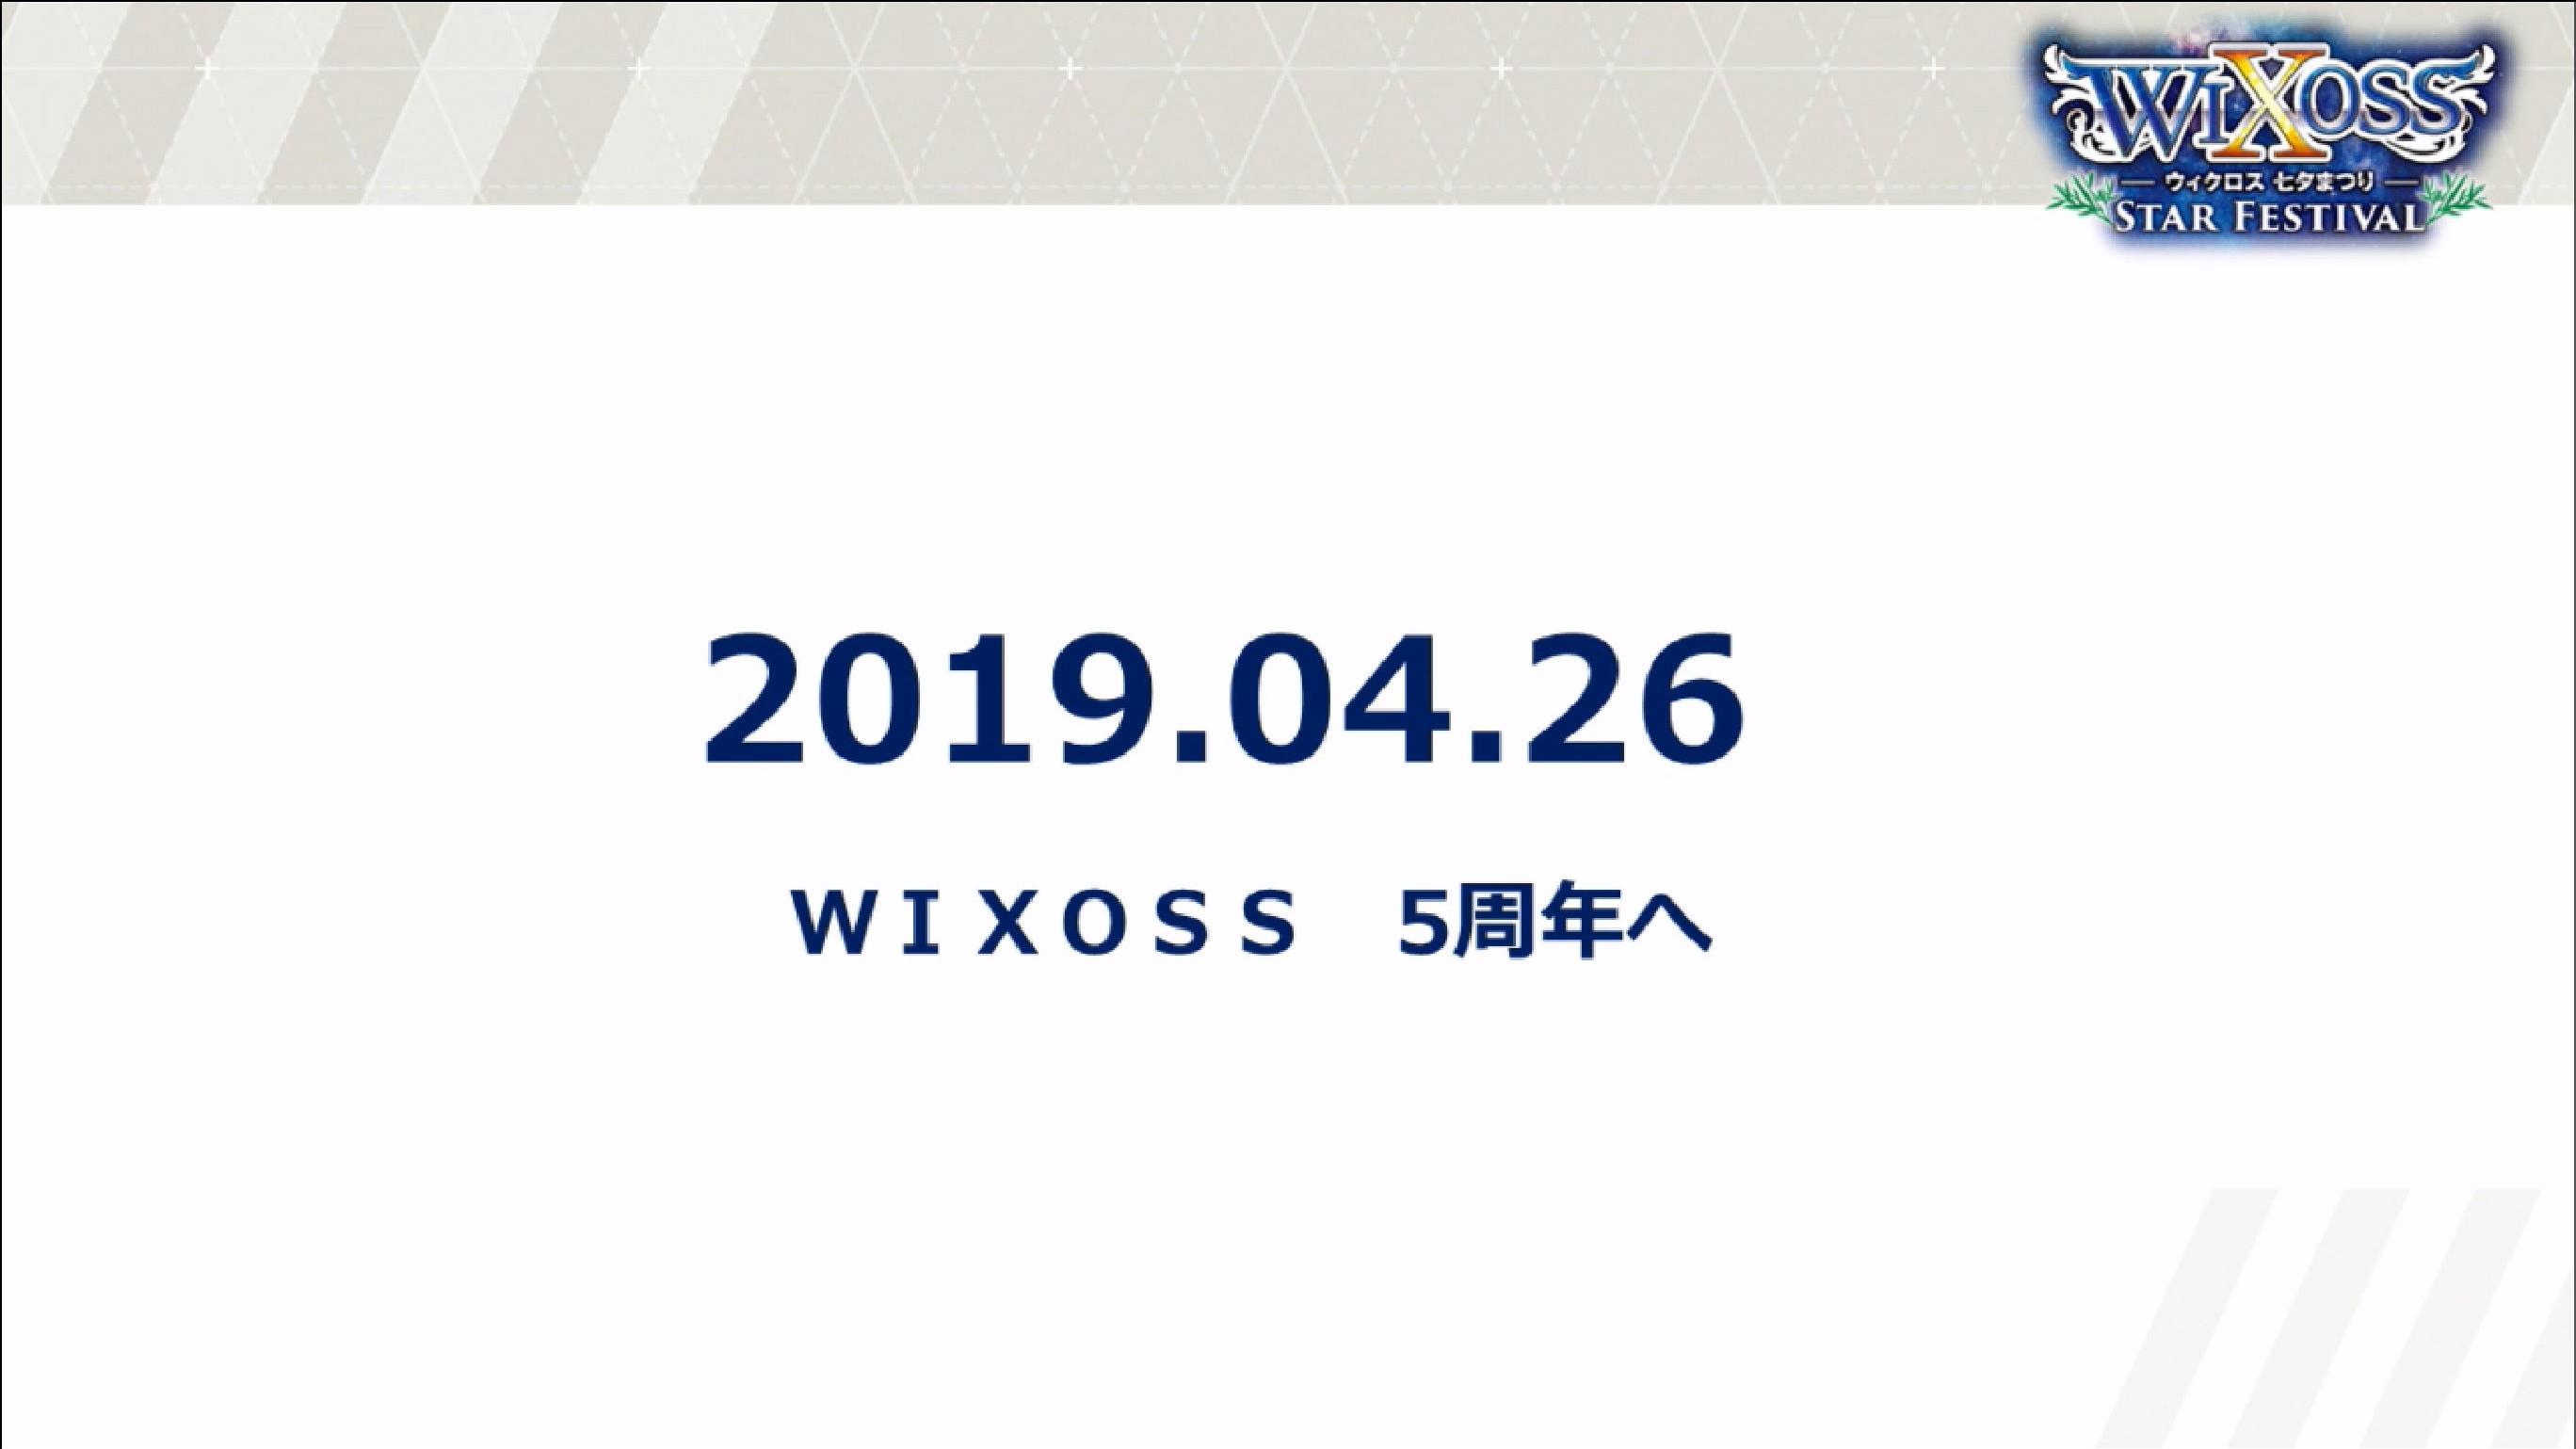 wixxos-live-20180701-074.jpg